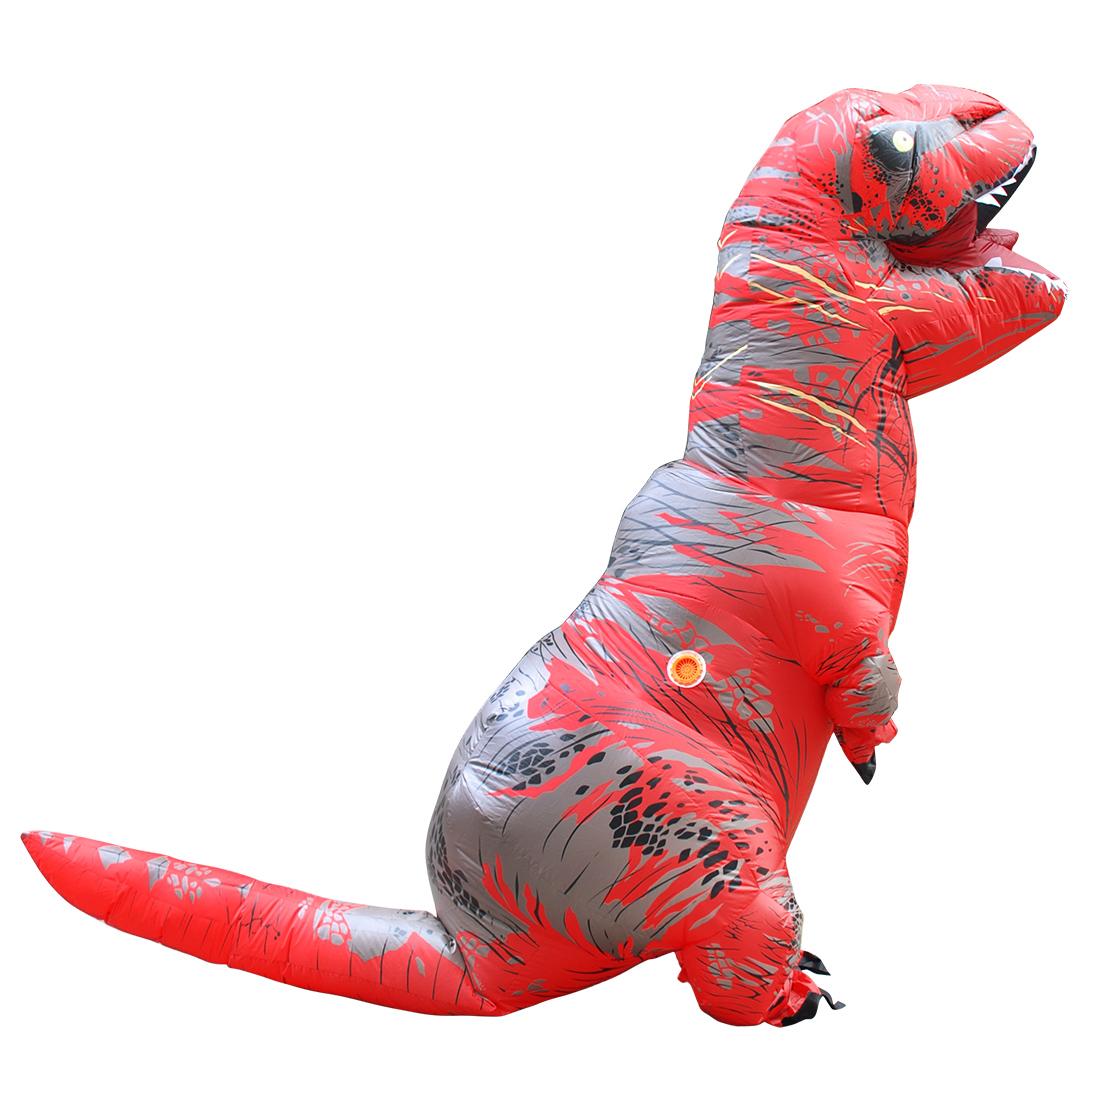 Disfraces Adultos Red T-REX Inflatable Dinosaur Costume Halloween